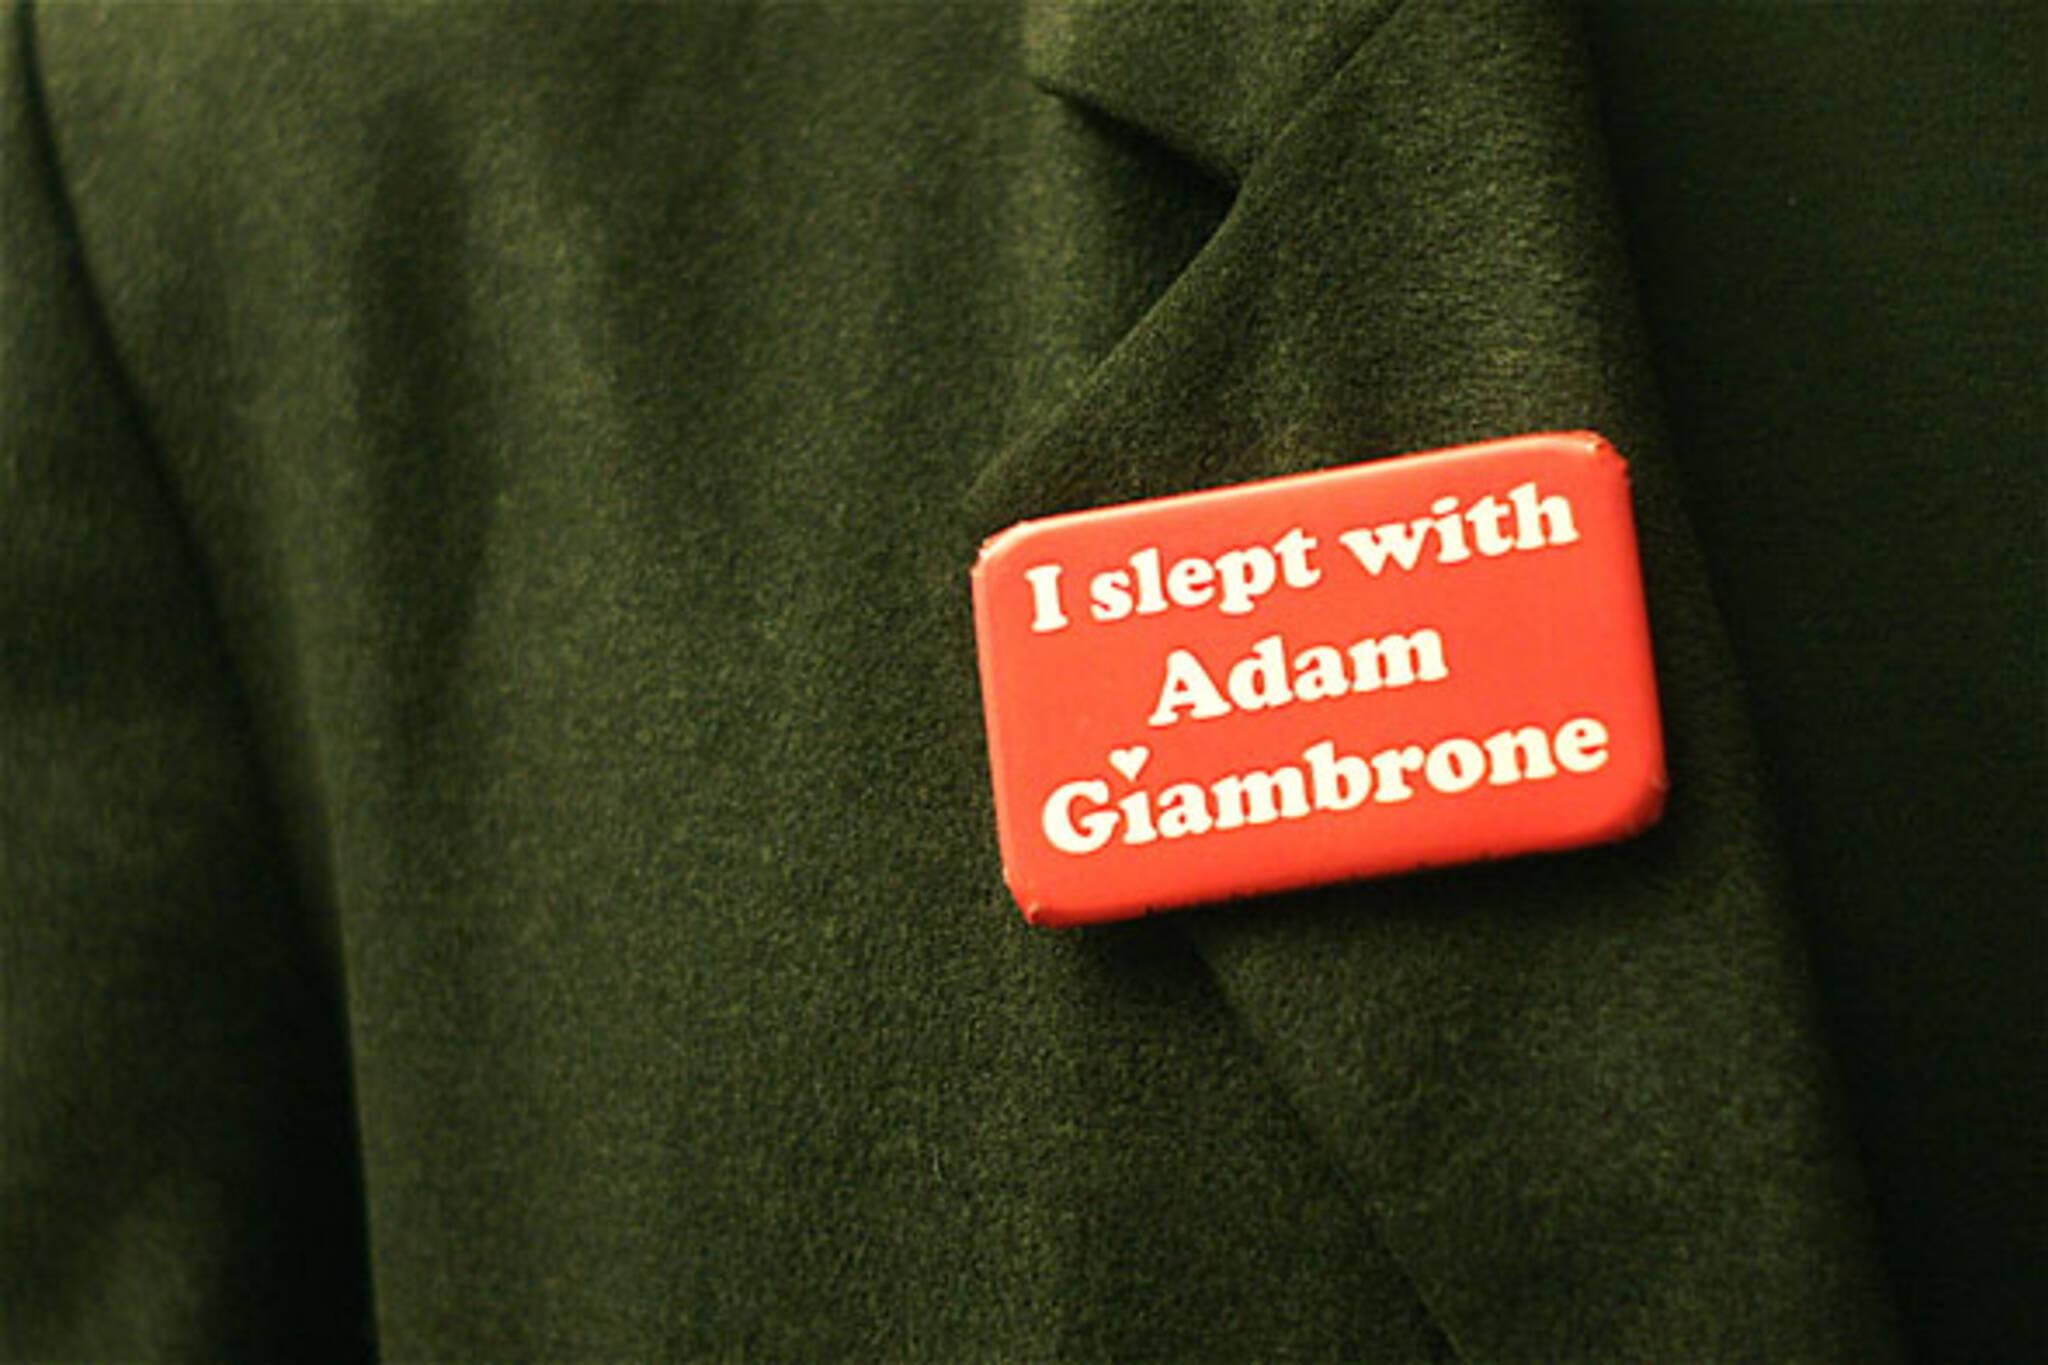 I Slept With Adam Giambrone